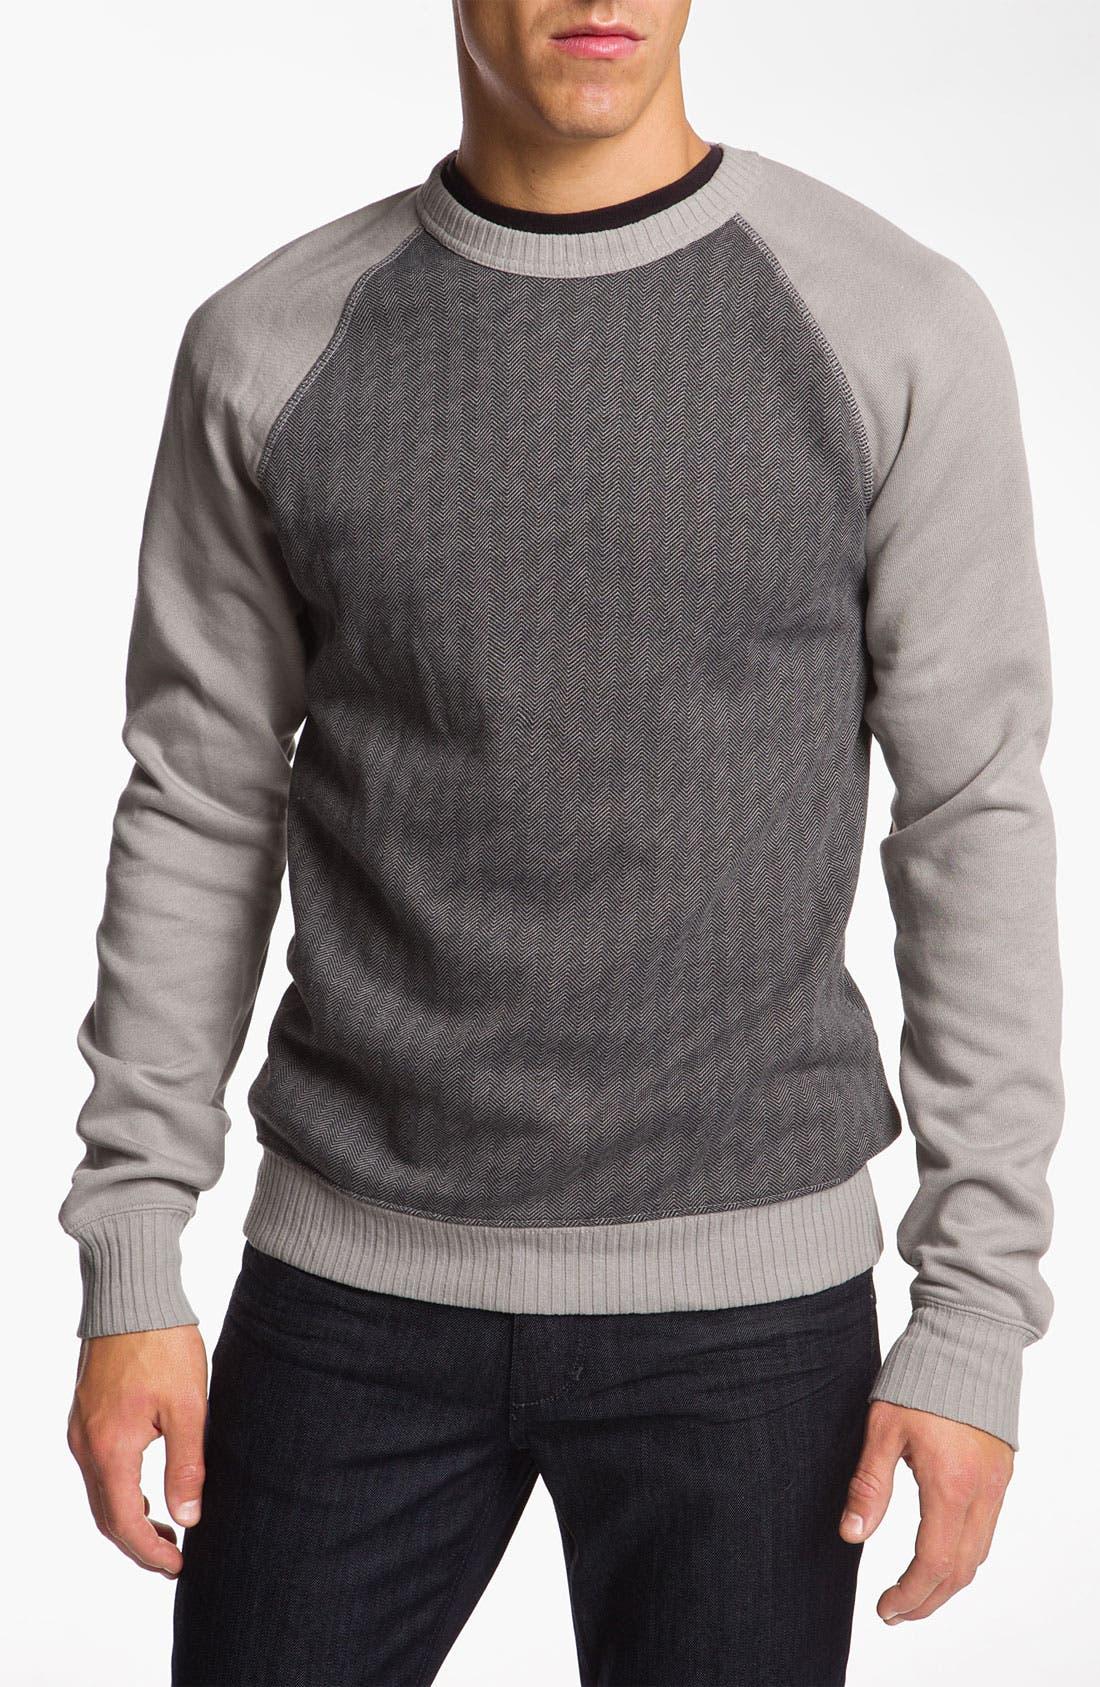 Main Image - Alternative 'Chuck' Sweatshirt